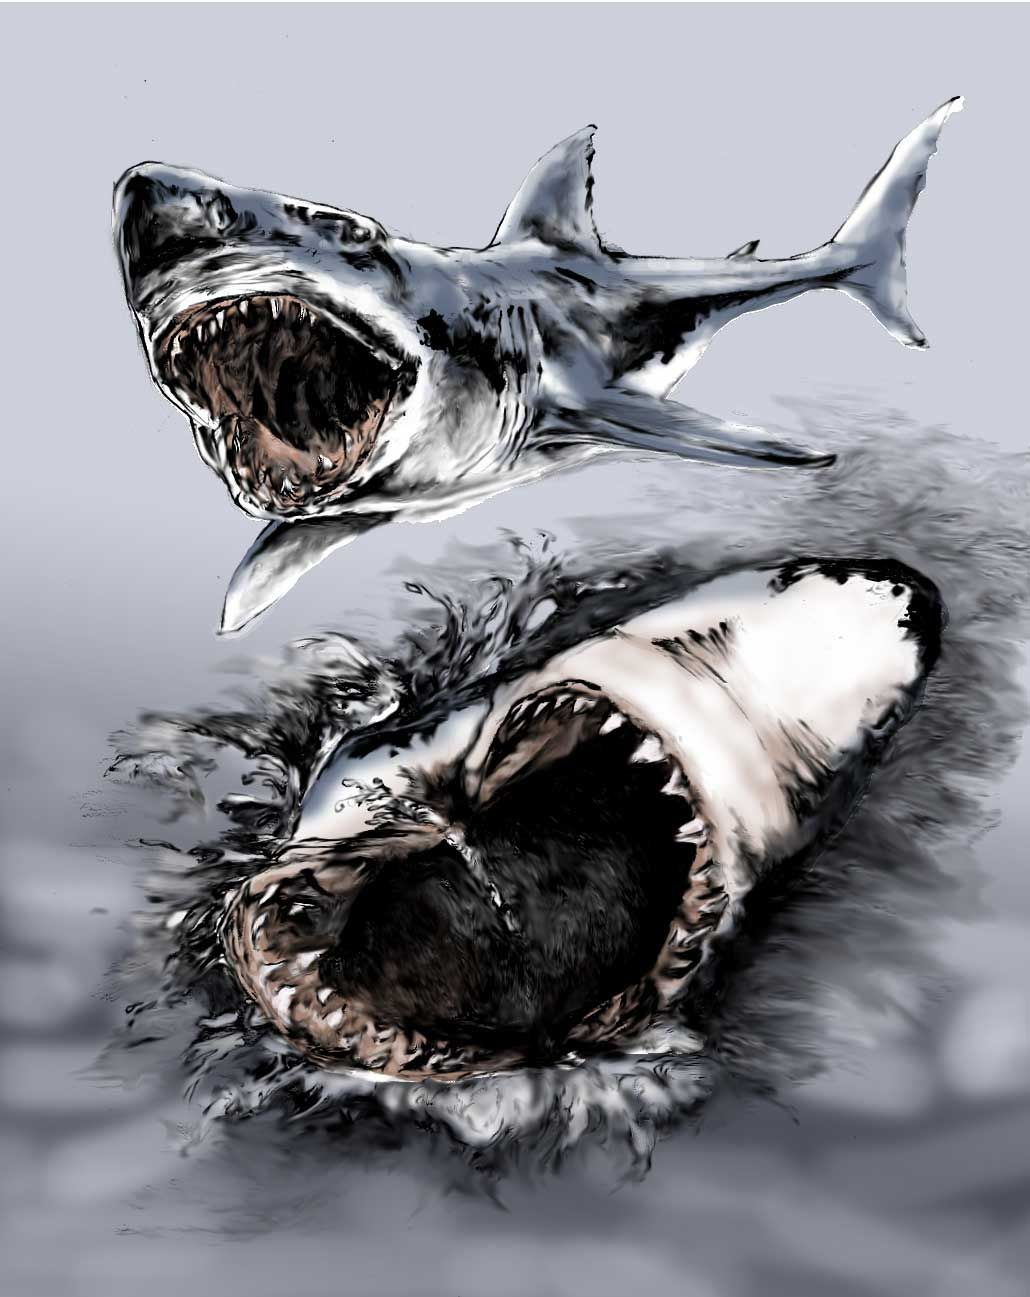 1030x1297 Tatoos Ideas Cool Great White Shark Tattoo Design Drawings